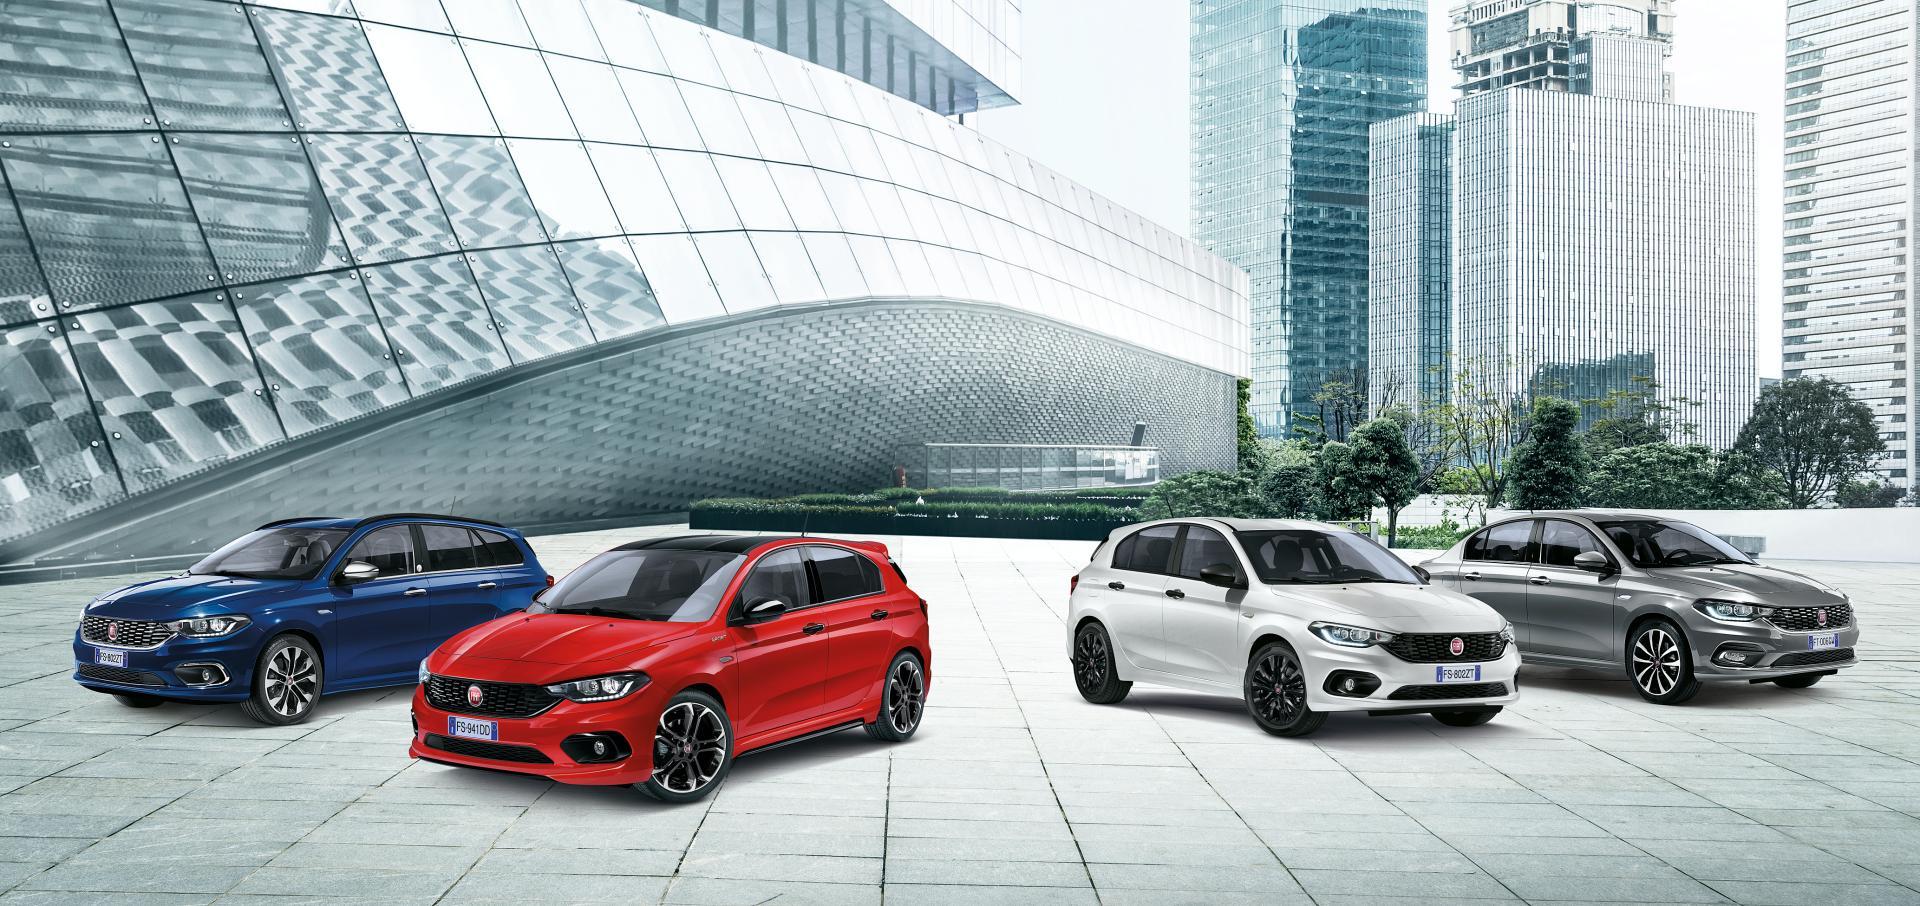 Fiat-Tipo-More-range-5